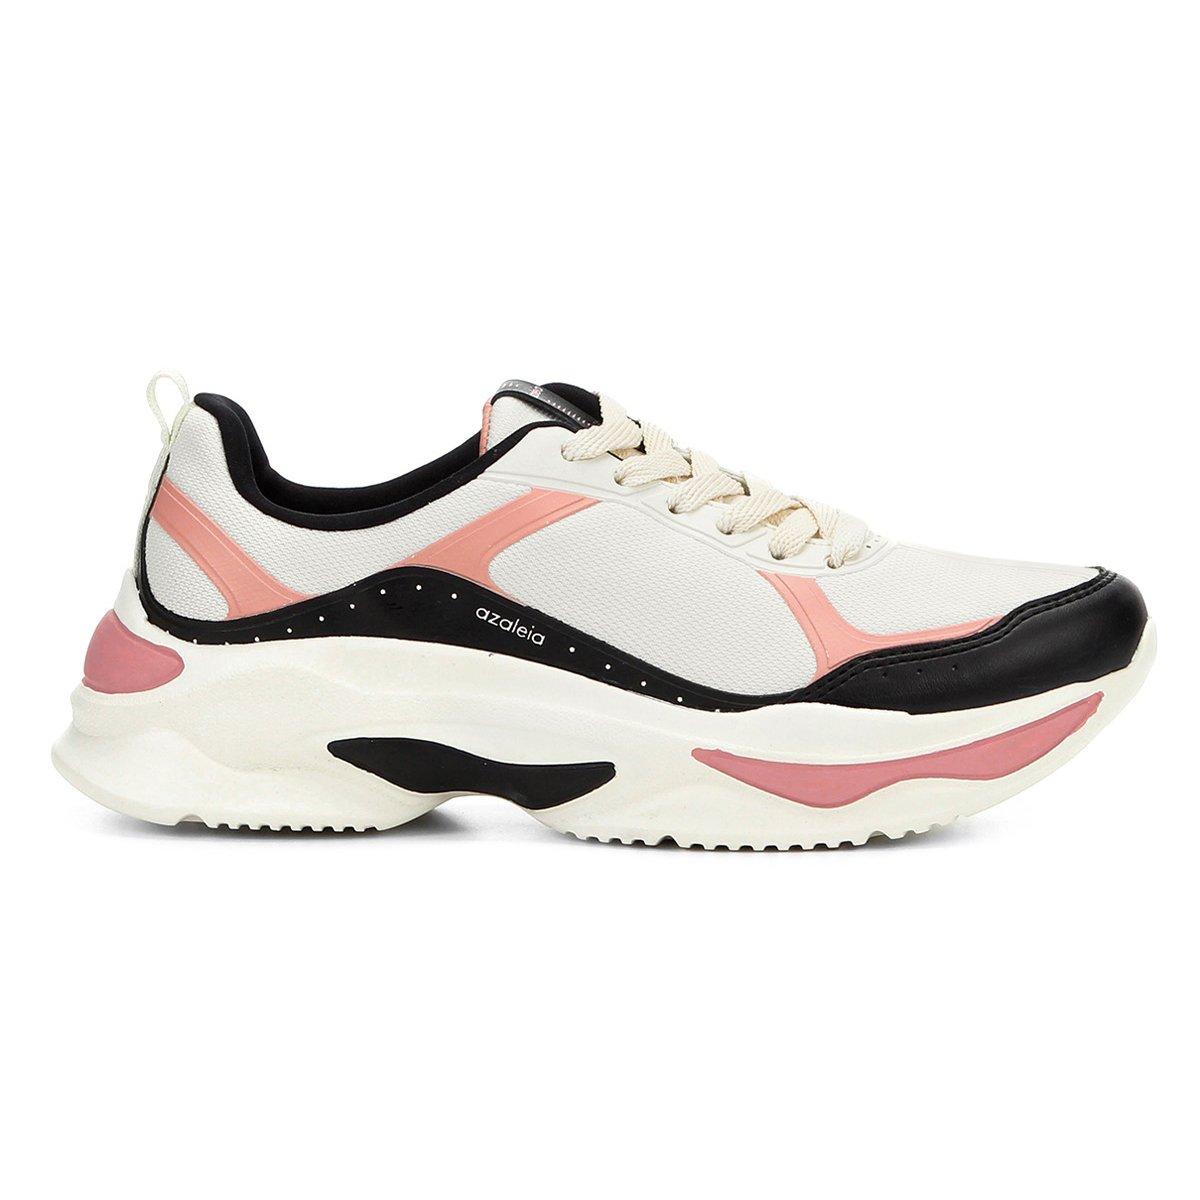 7983a5aaedc Tênis Azaleia Chunky Sneaker Feminino Preto e Rosa - Compre Agora ...